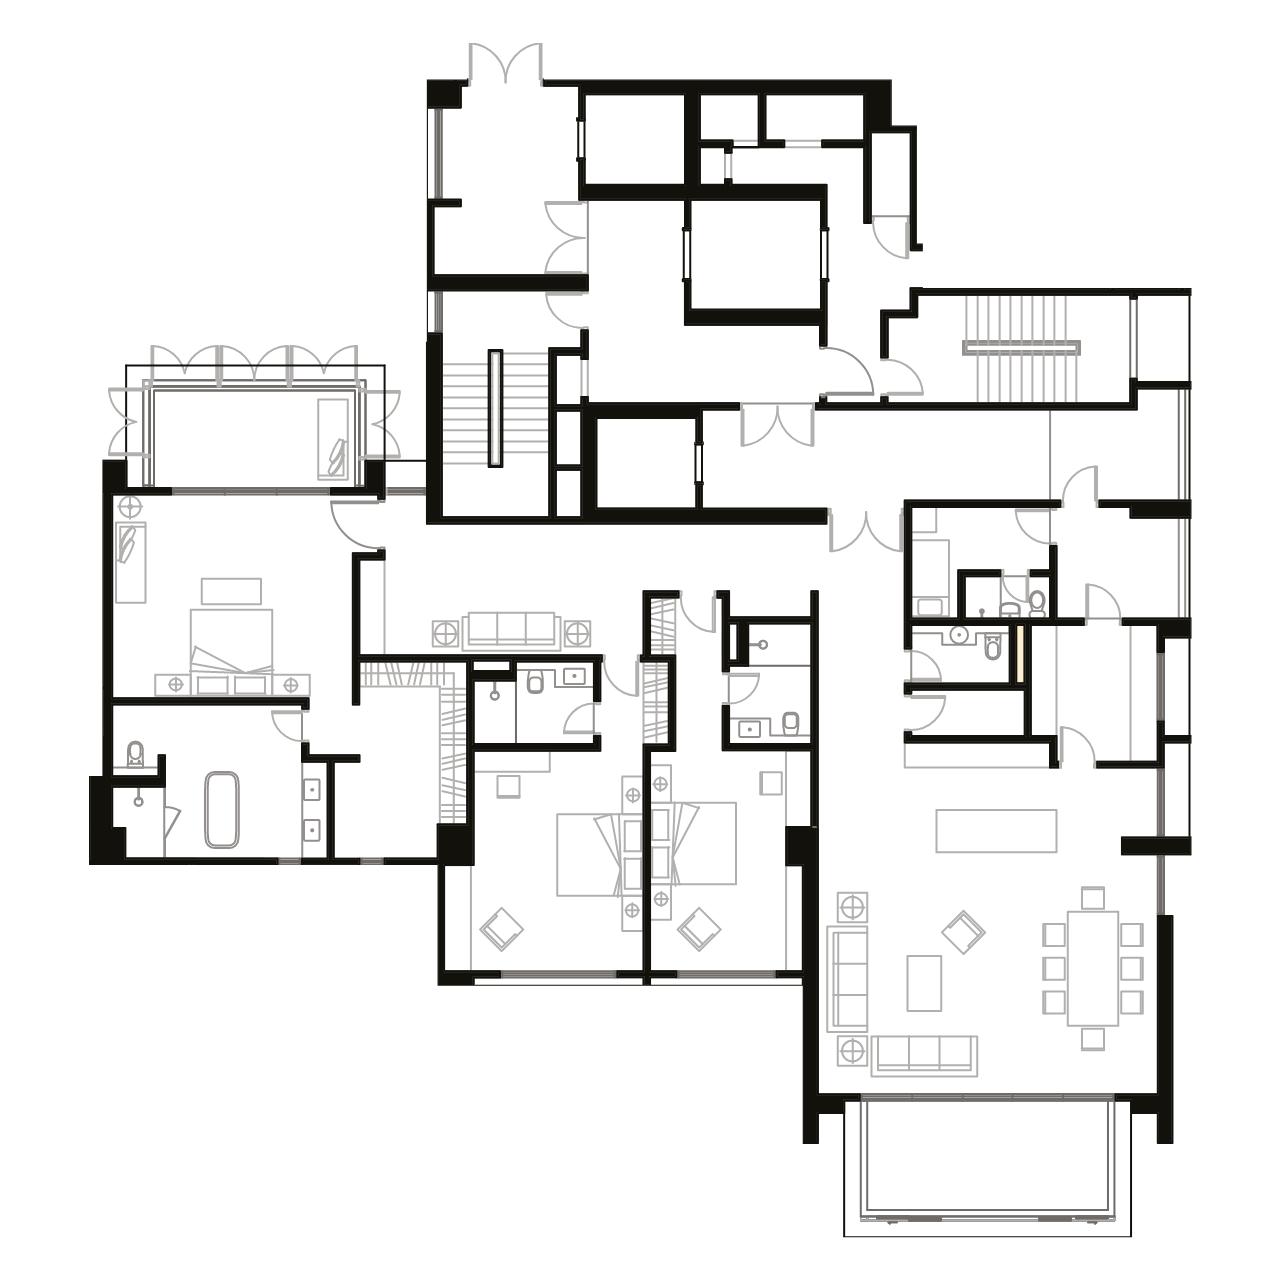 Ampang Condominium Floor Plan A2